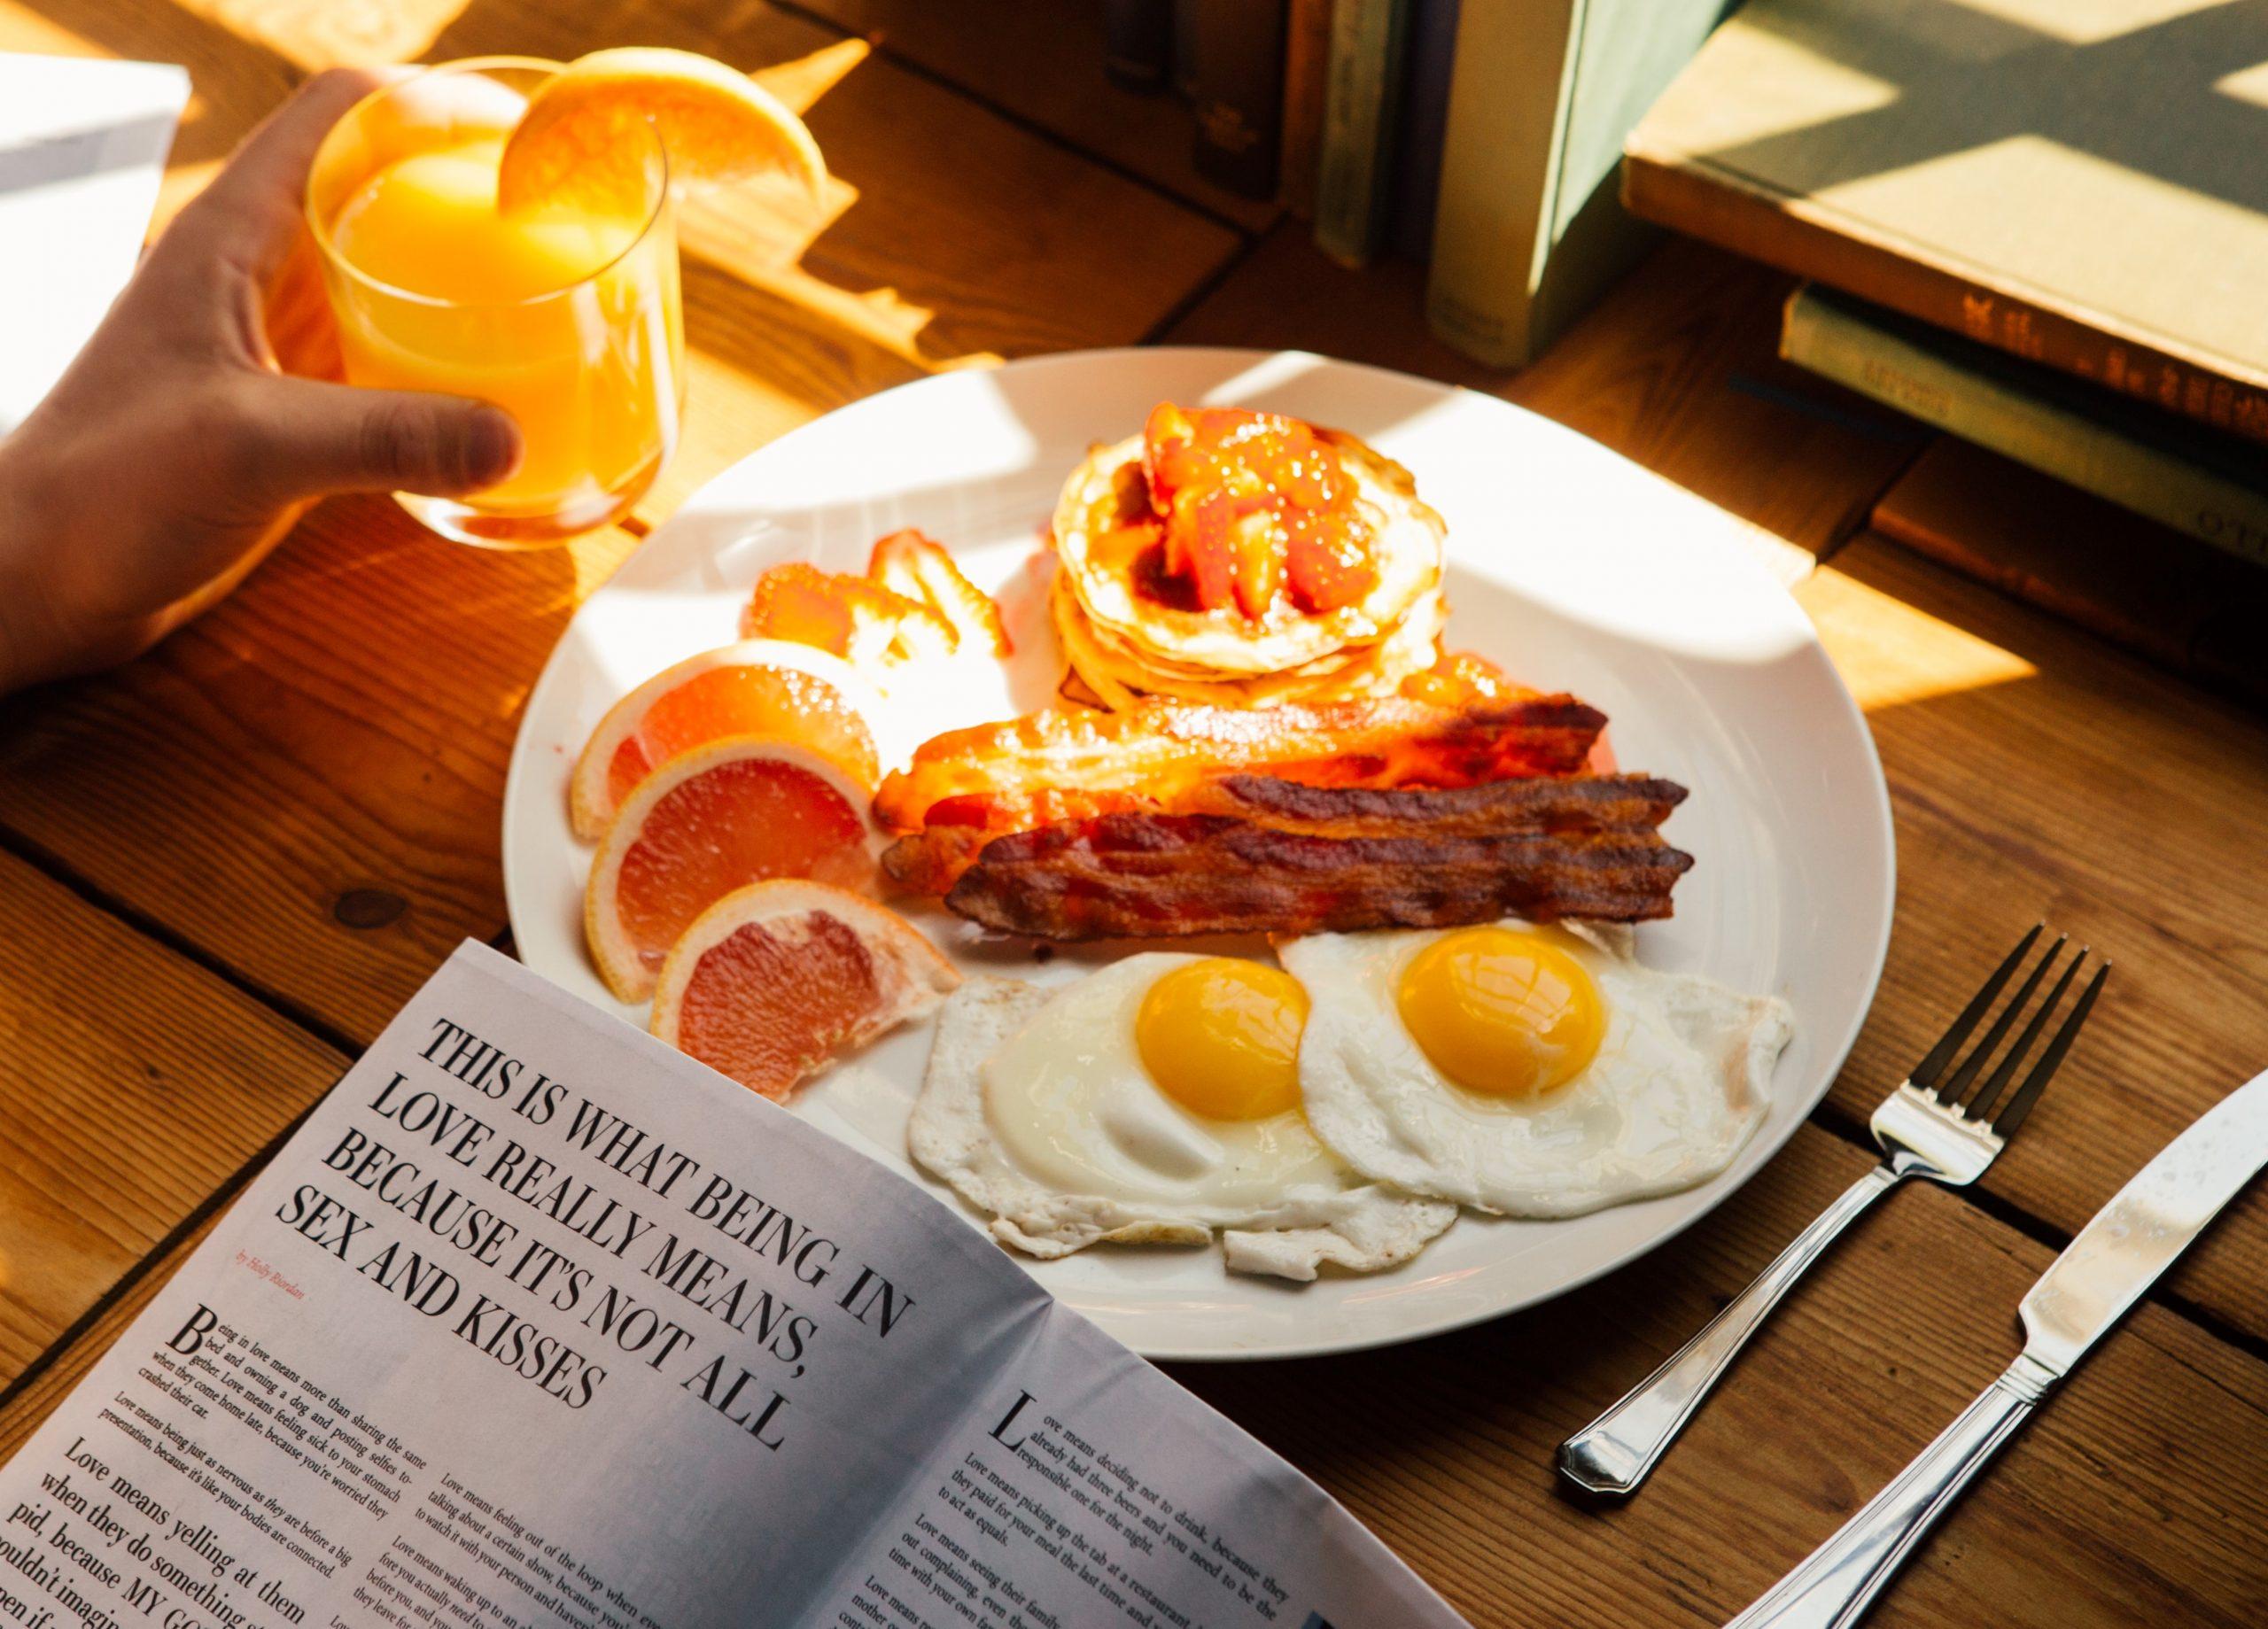 Pancake salati con bacon e uova